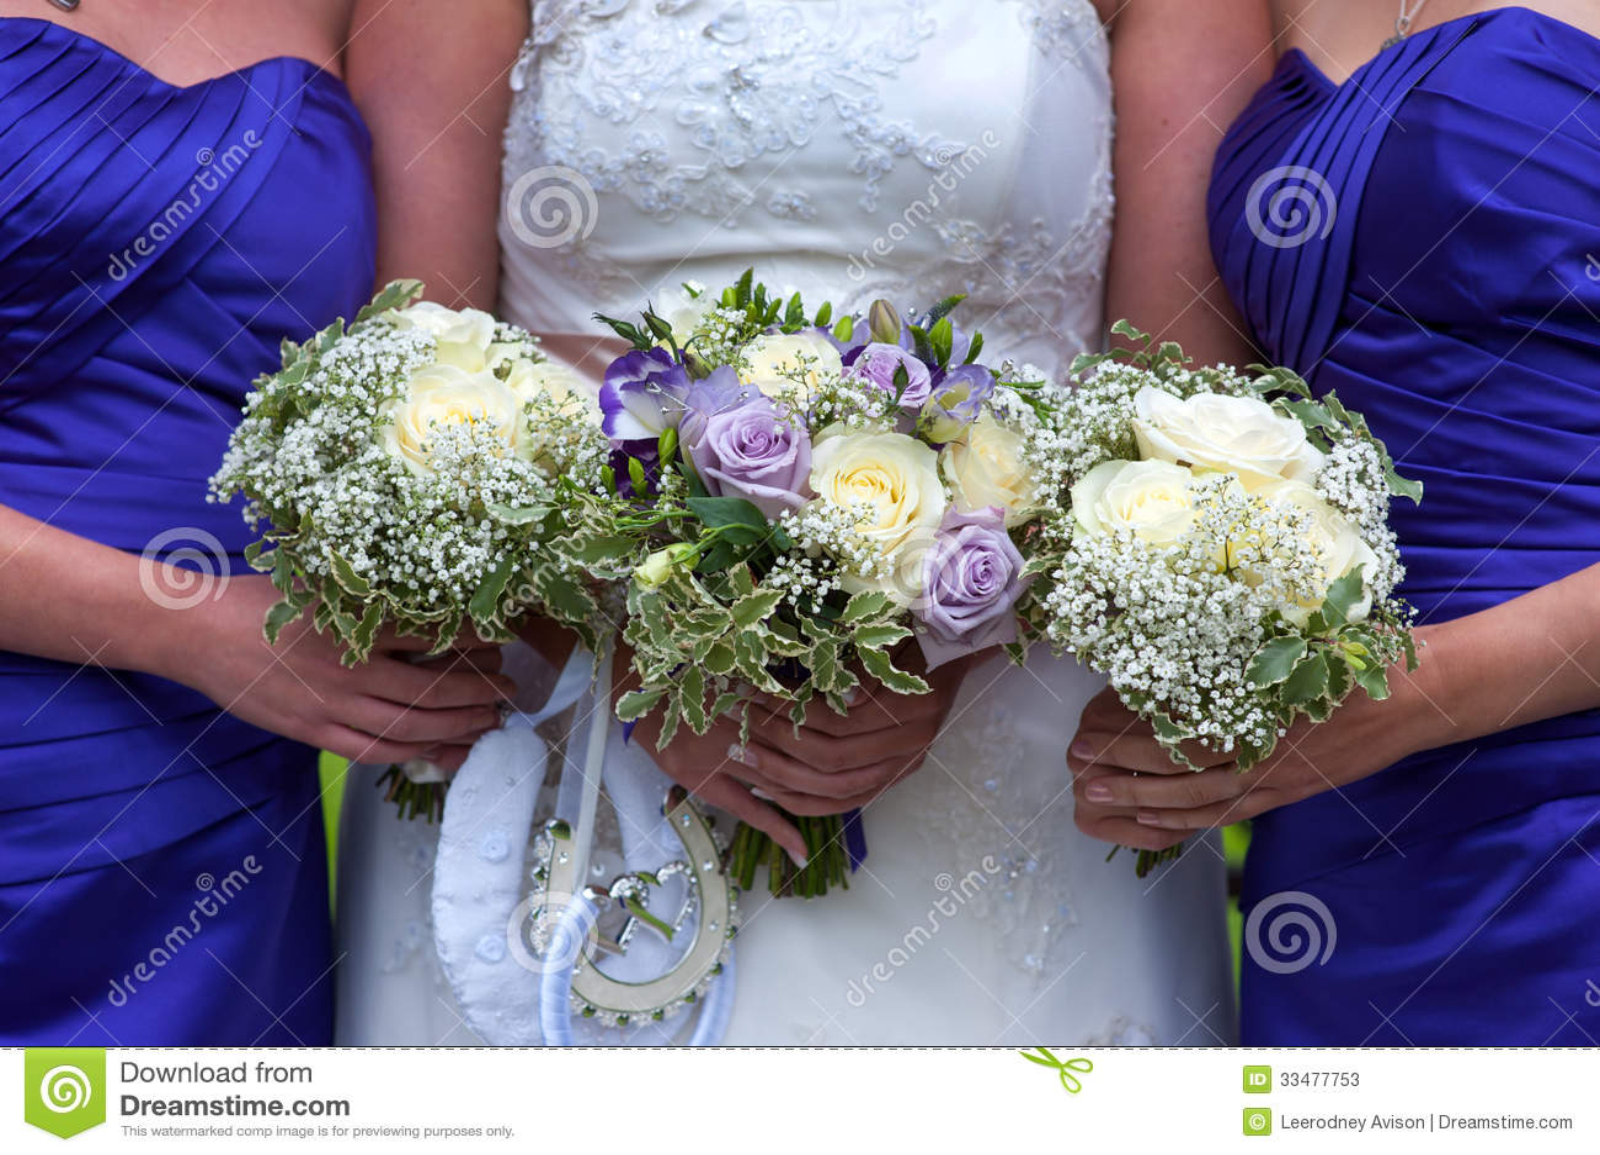 Bride and bridesmaids with wedding bouquets stock image image of bride and bridesmaids with wedding bouquets izmirmasajfo